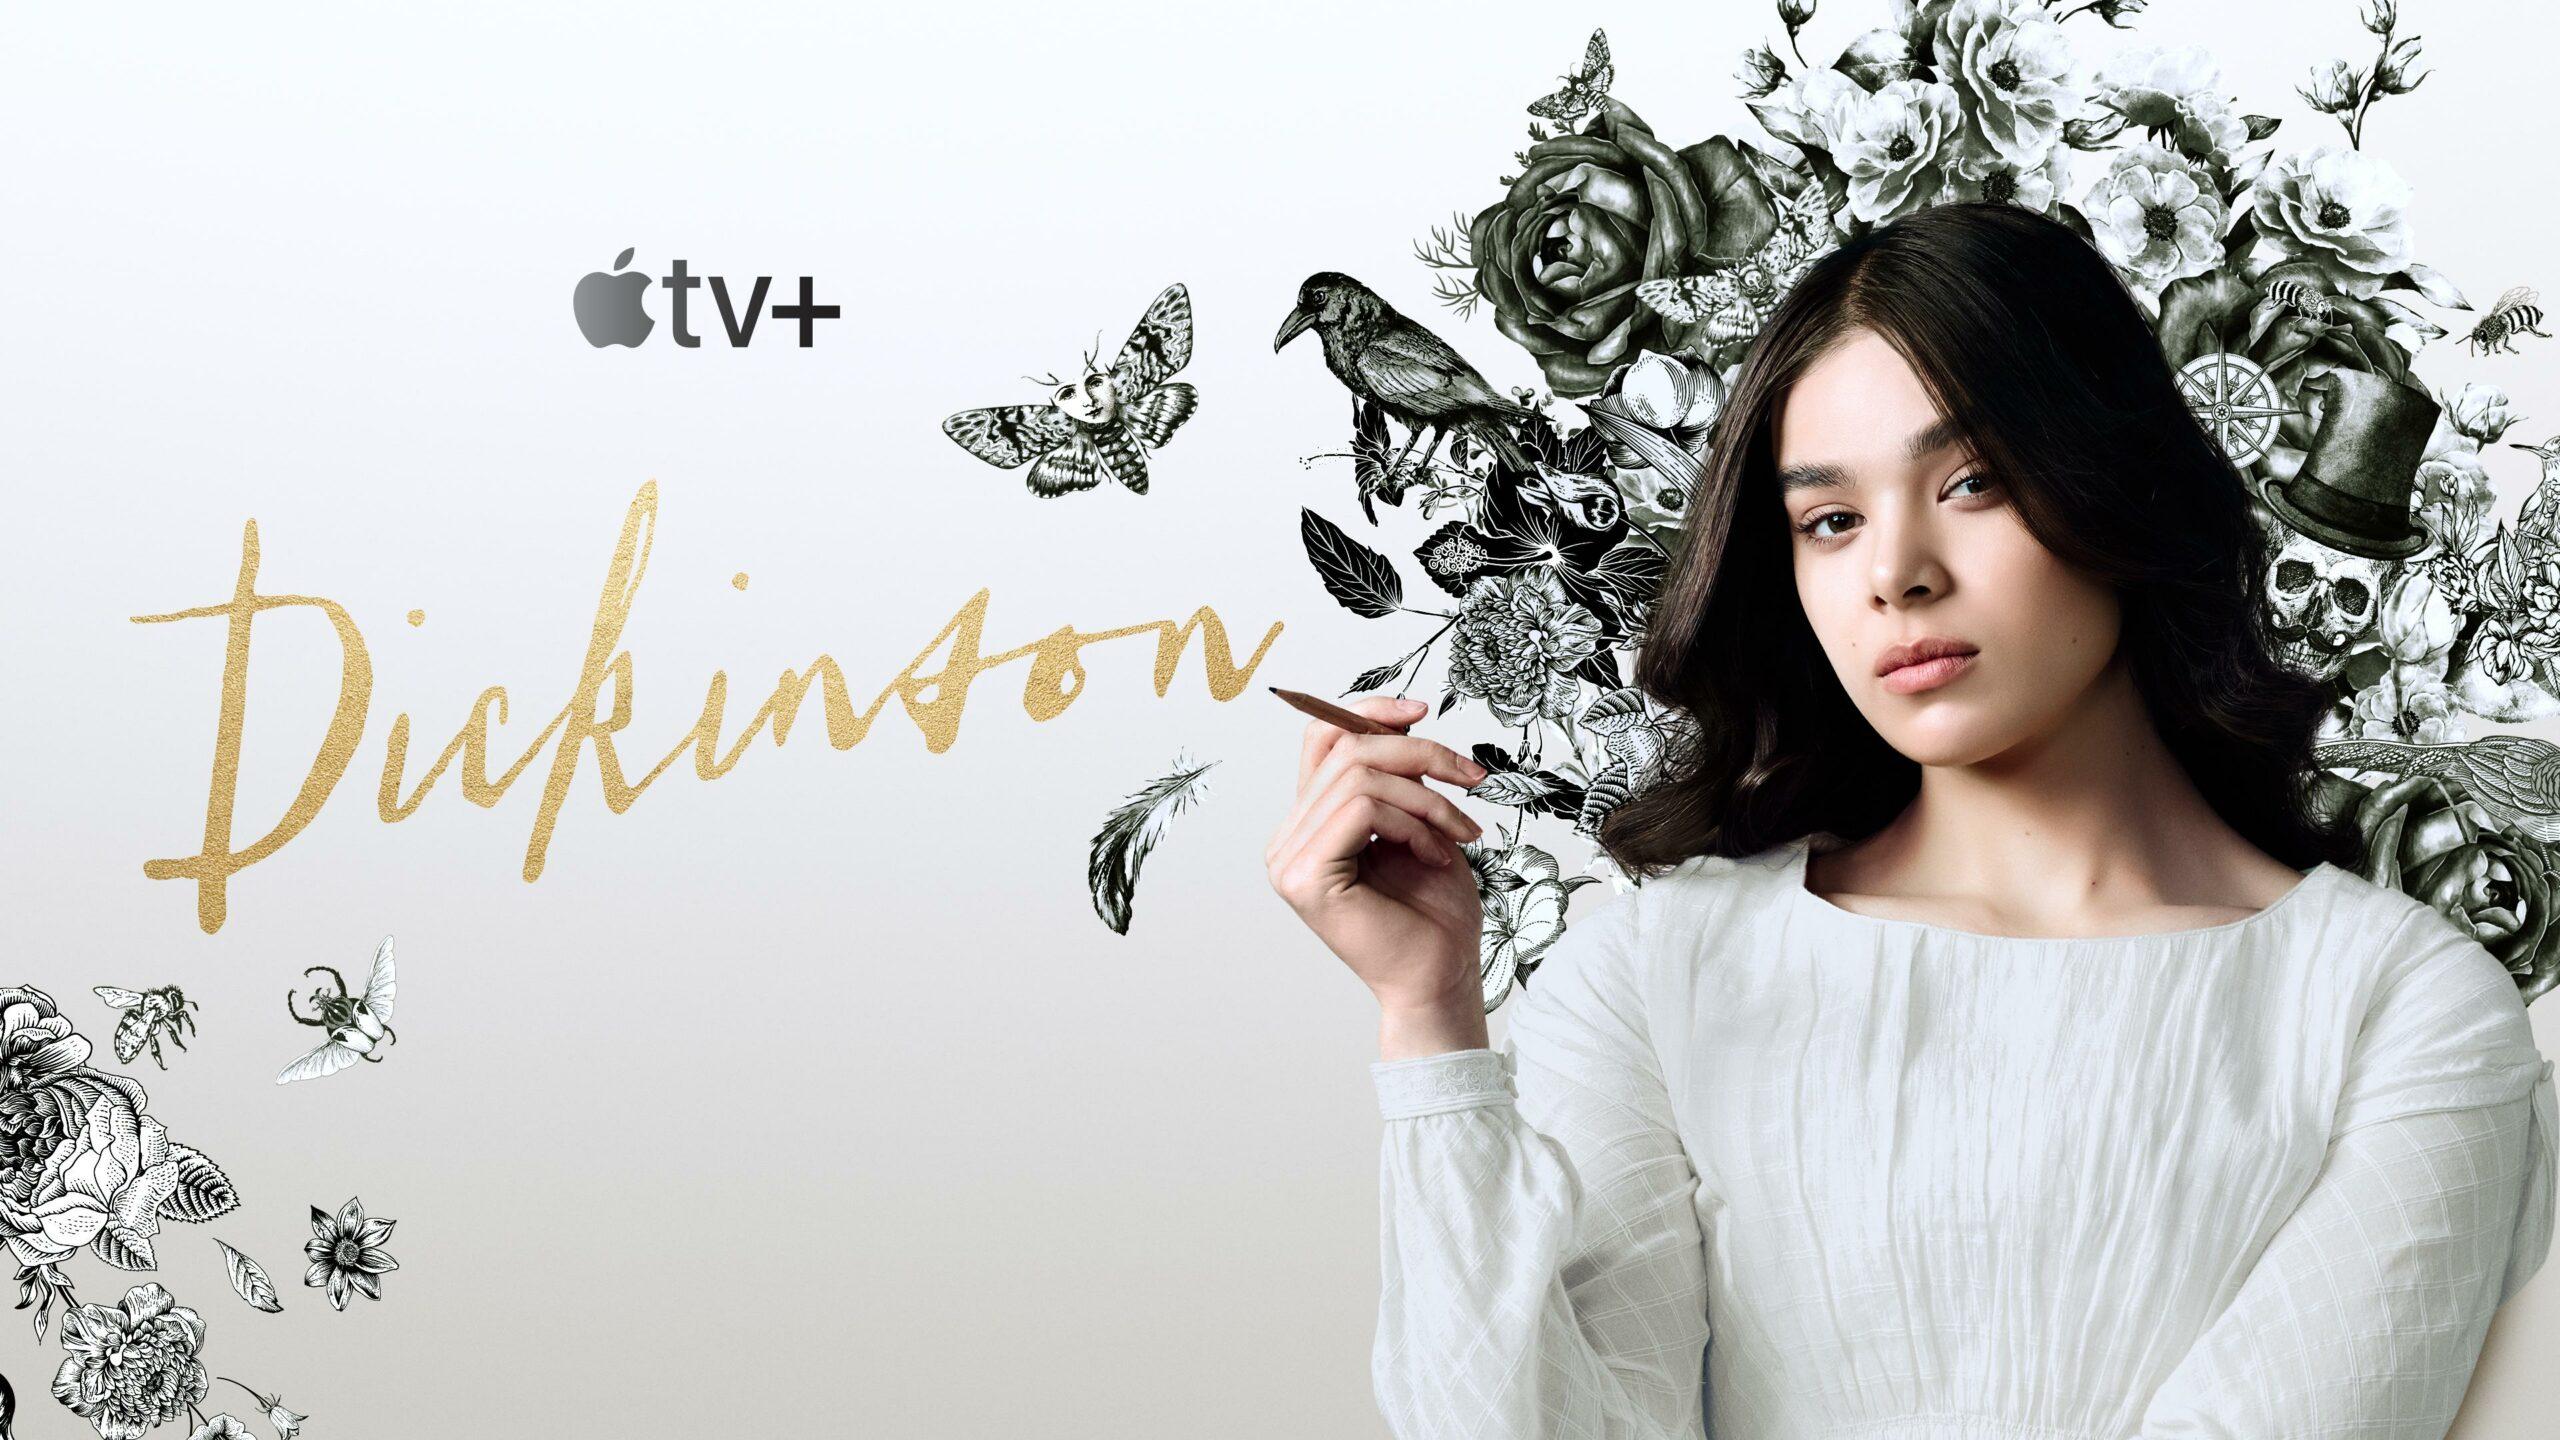 Dickinson-recesione-1